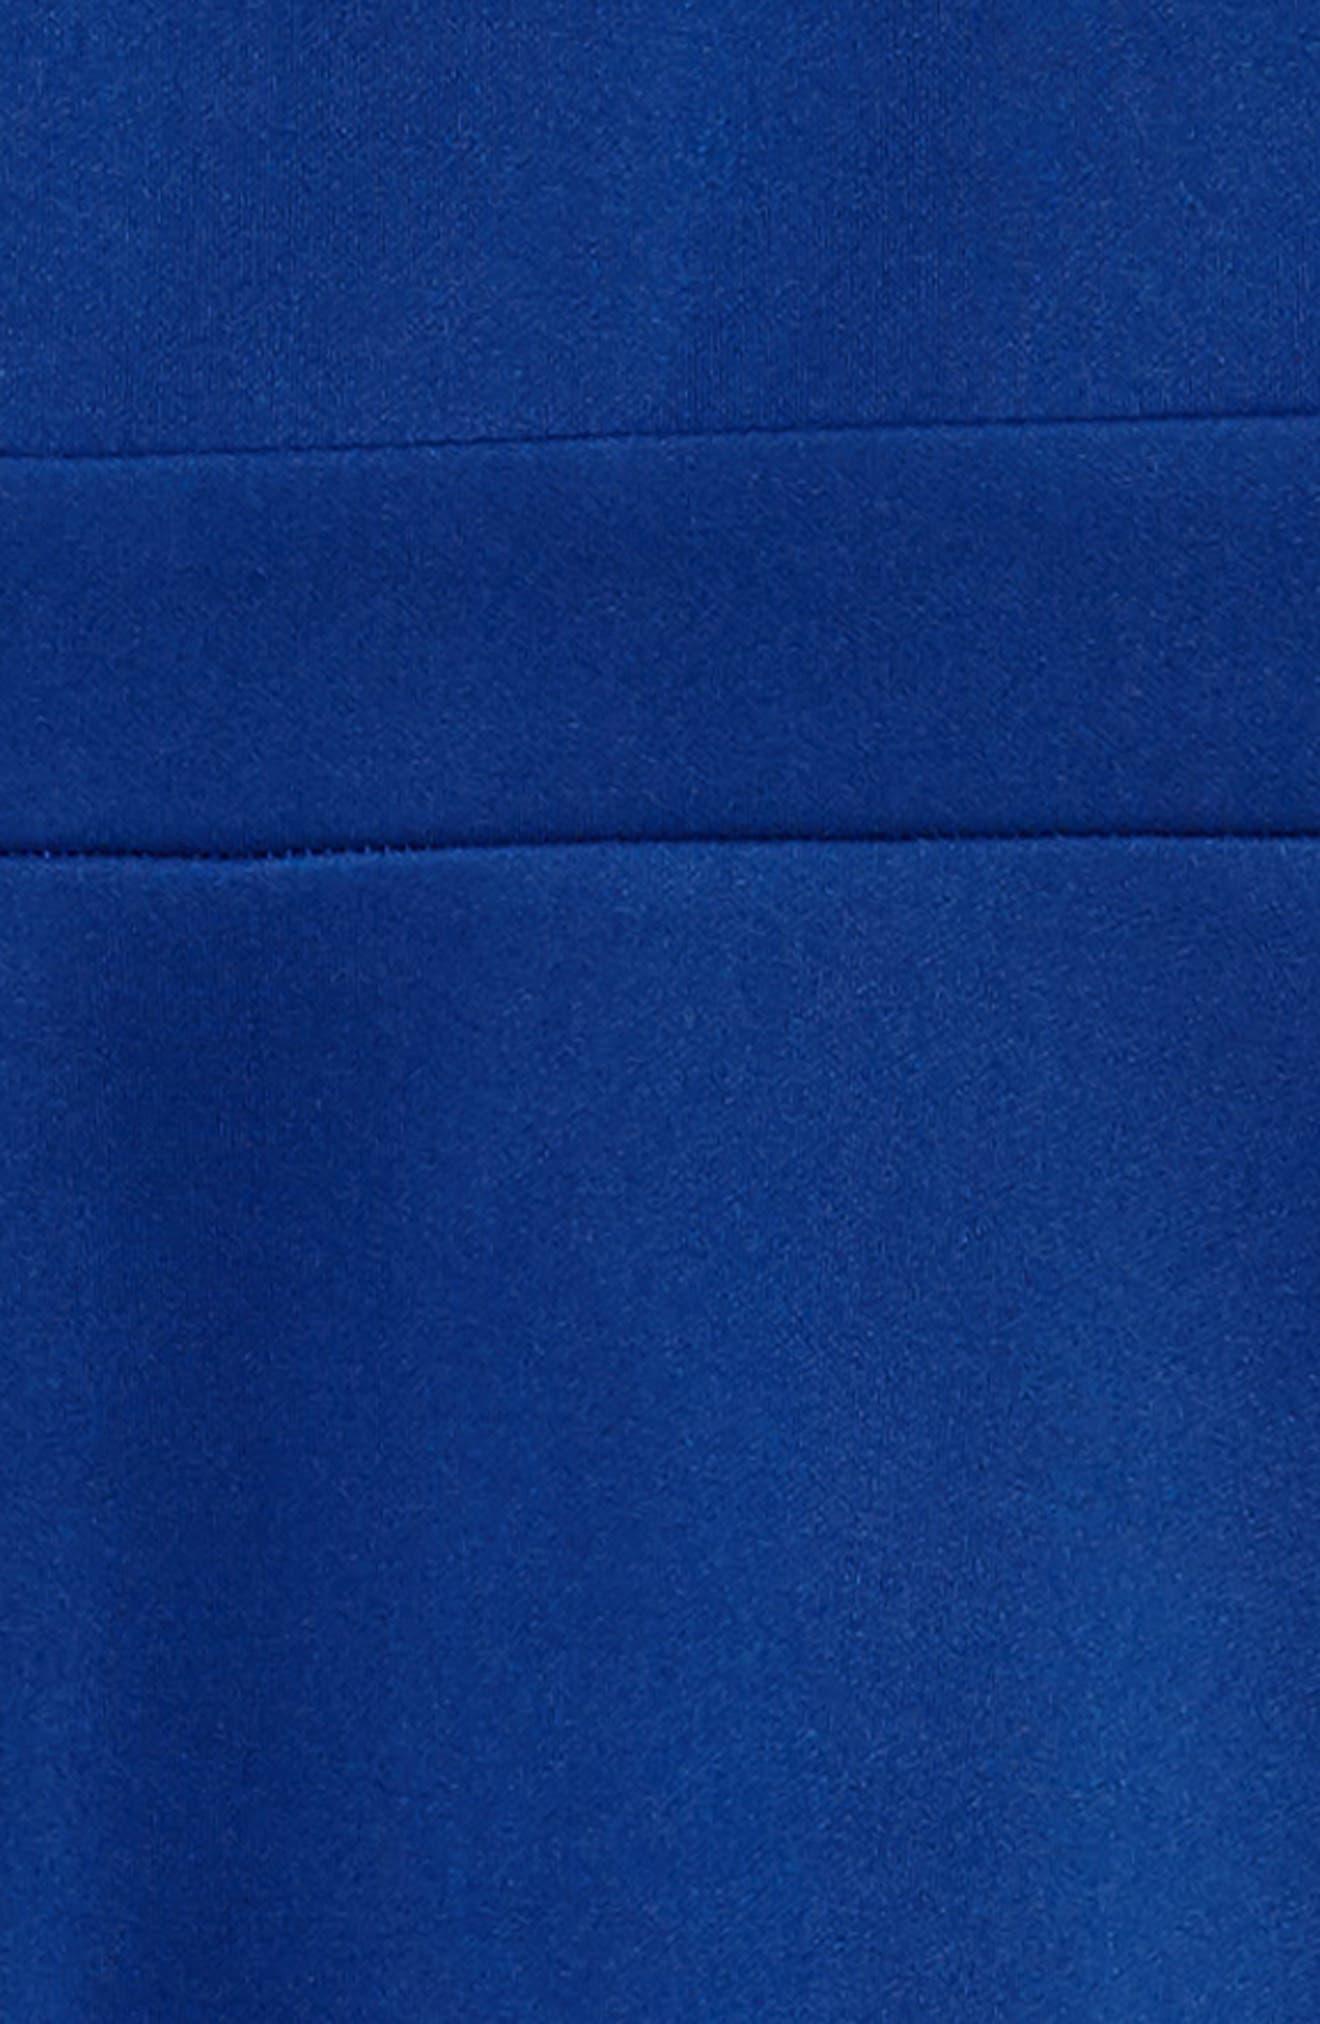 Illusion Neck Skater Dress,                             Alternate thumbnail 3, color,                             420